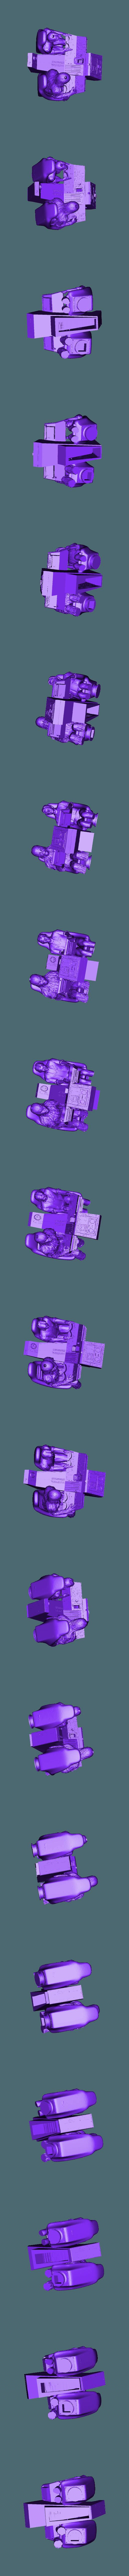 HAN_CHEWIE.obj Download free OBJ file Deagostini Cockpit Han and Chewie replacement parts • 3D print design, boryelwoc